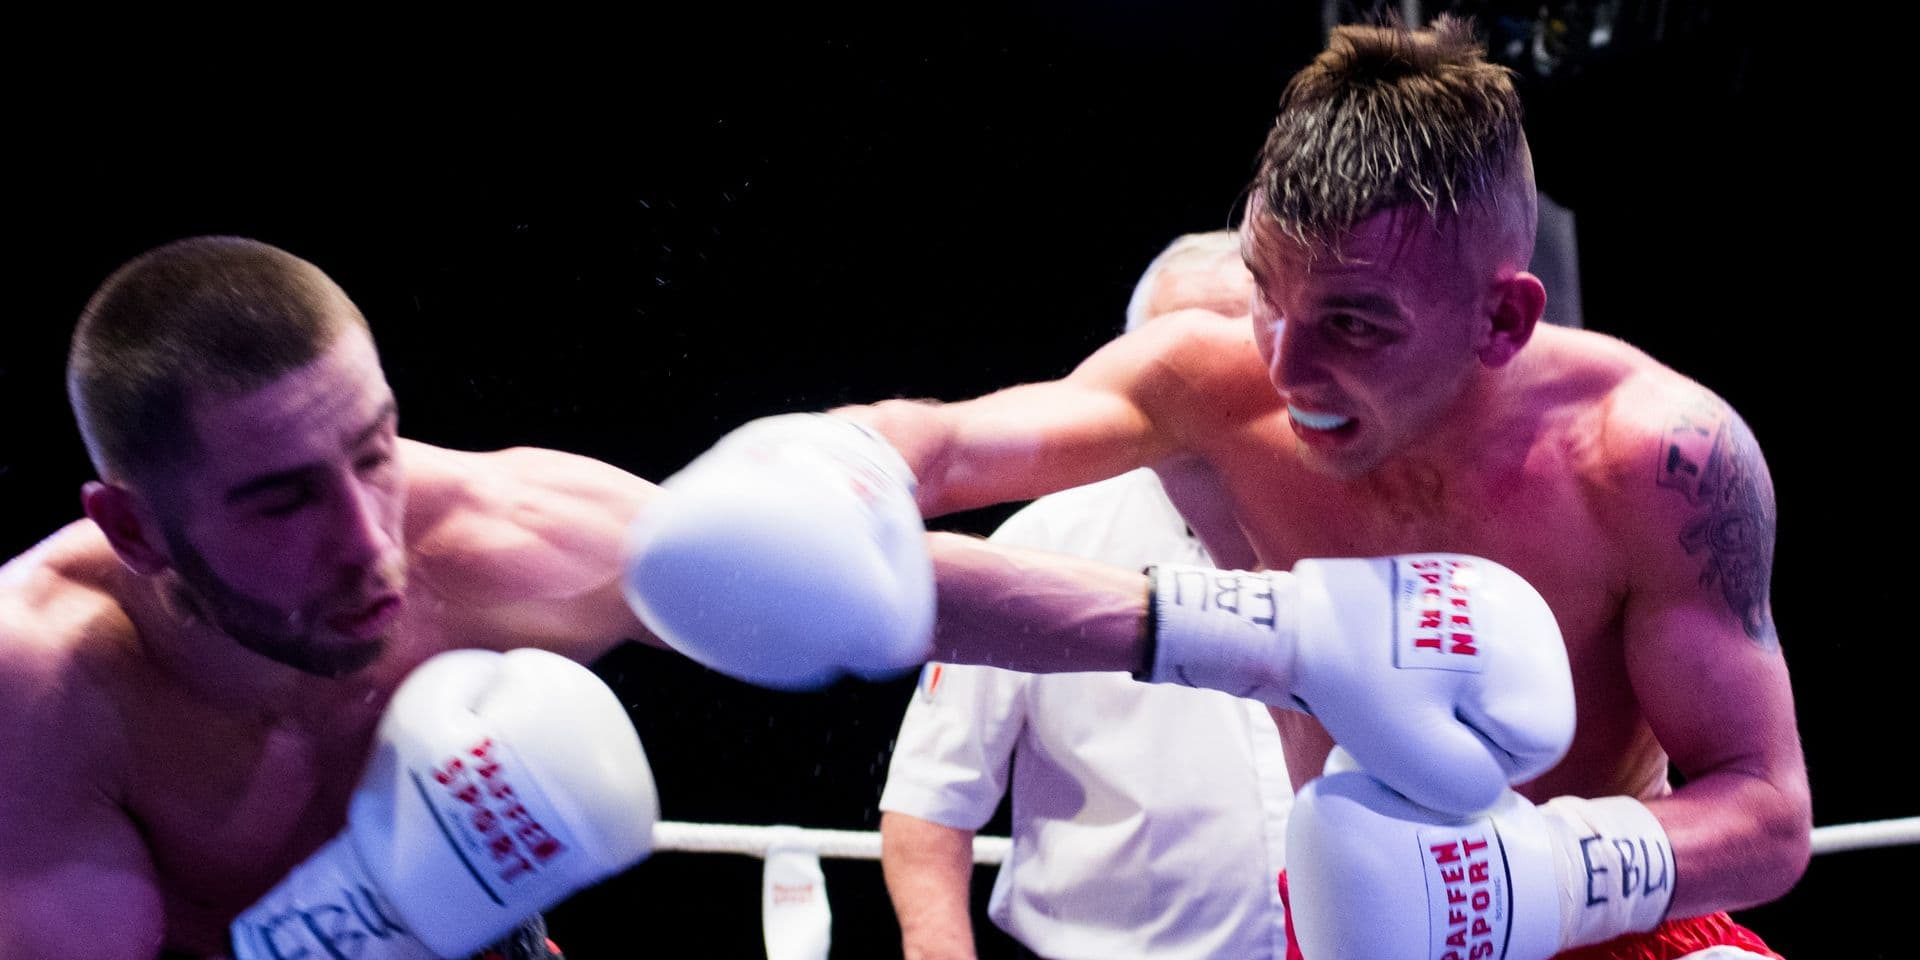 Boxe : Stéphane Jamoye, de retour sur le ring